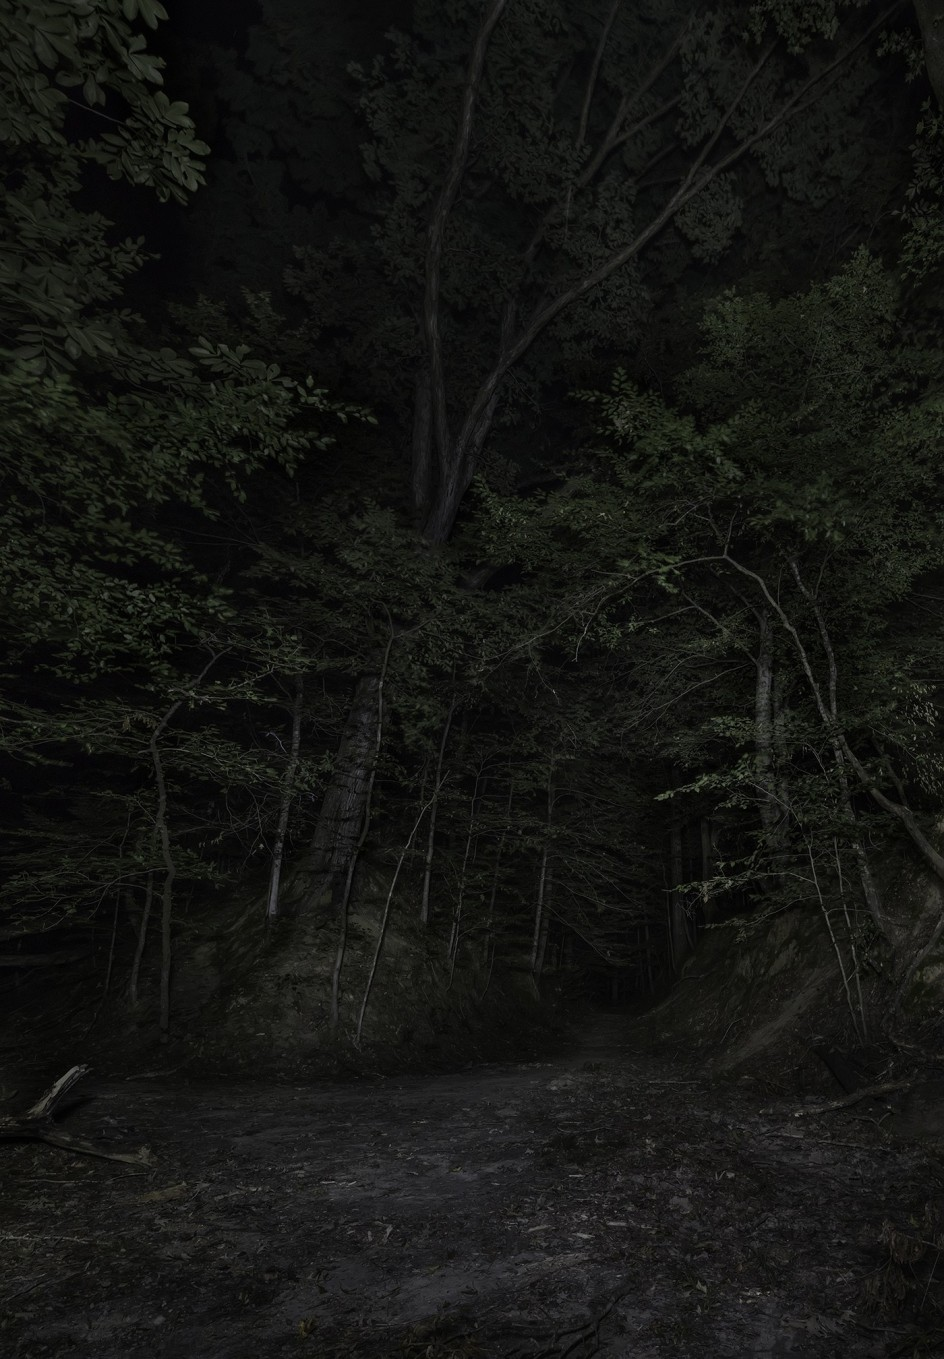 Jeanine Michna-Bales - Sunken Trace. Claiborne County, Mississippi, 2015. Foto del libro de Jeanine Michna-Bales sobre las rutas de fuga de los esclavos negros en el siglo XIX